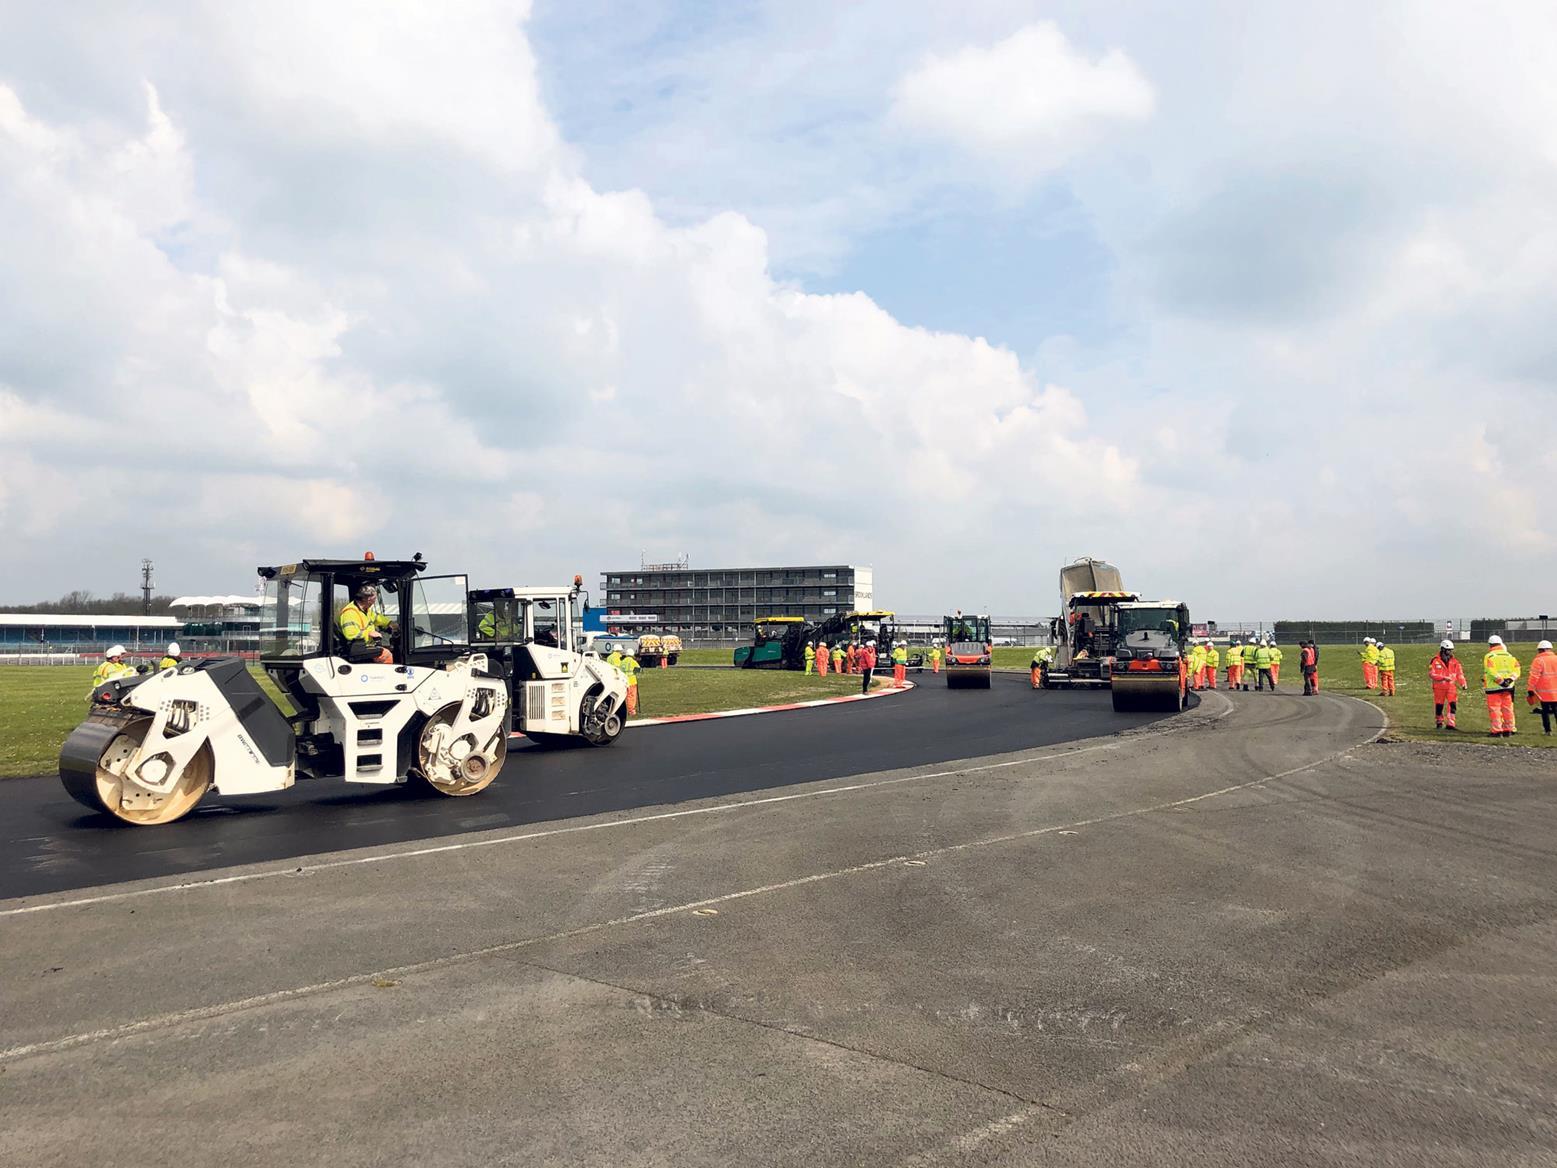 Resurfacing work will begin at Silverstone in June 2019